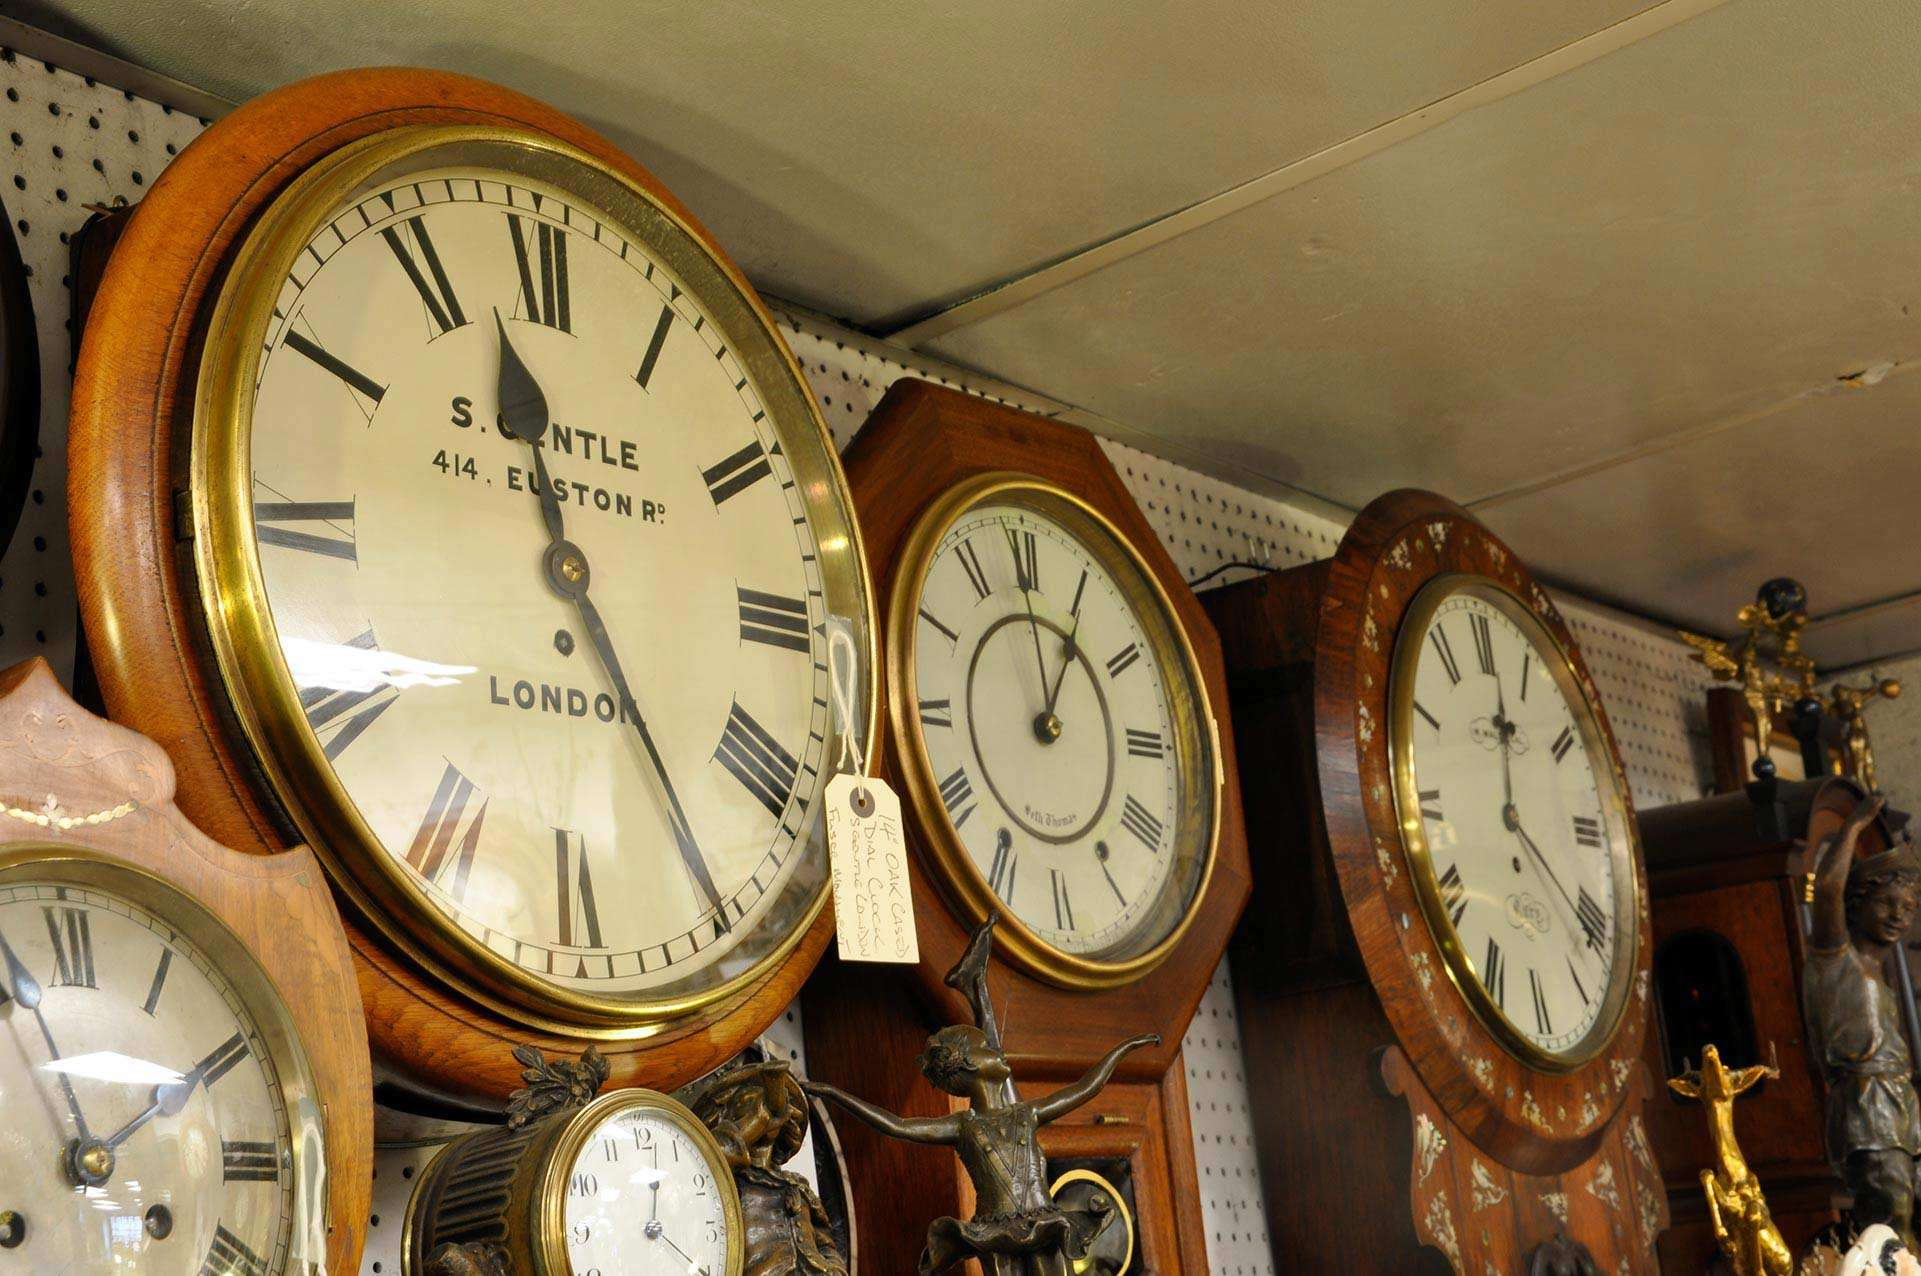 Range of clocks at St. Martins Antiques Centre